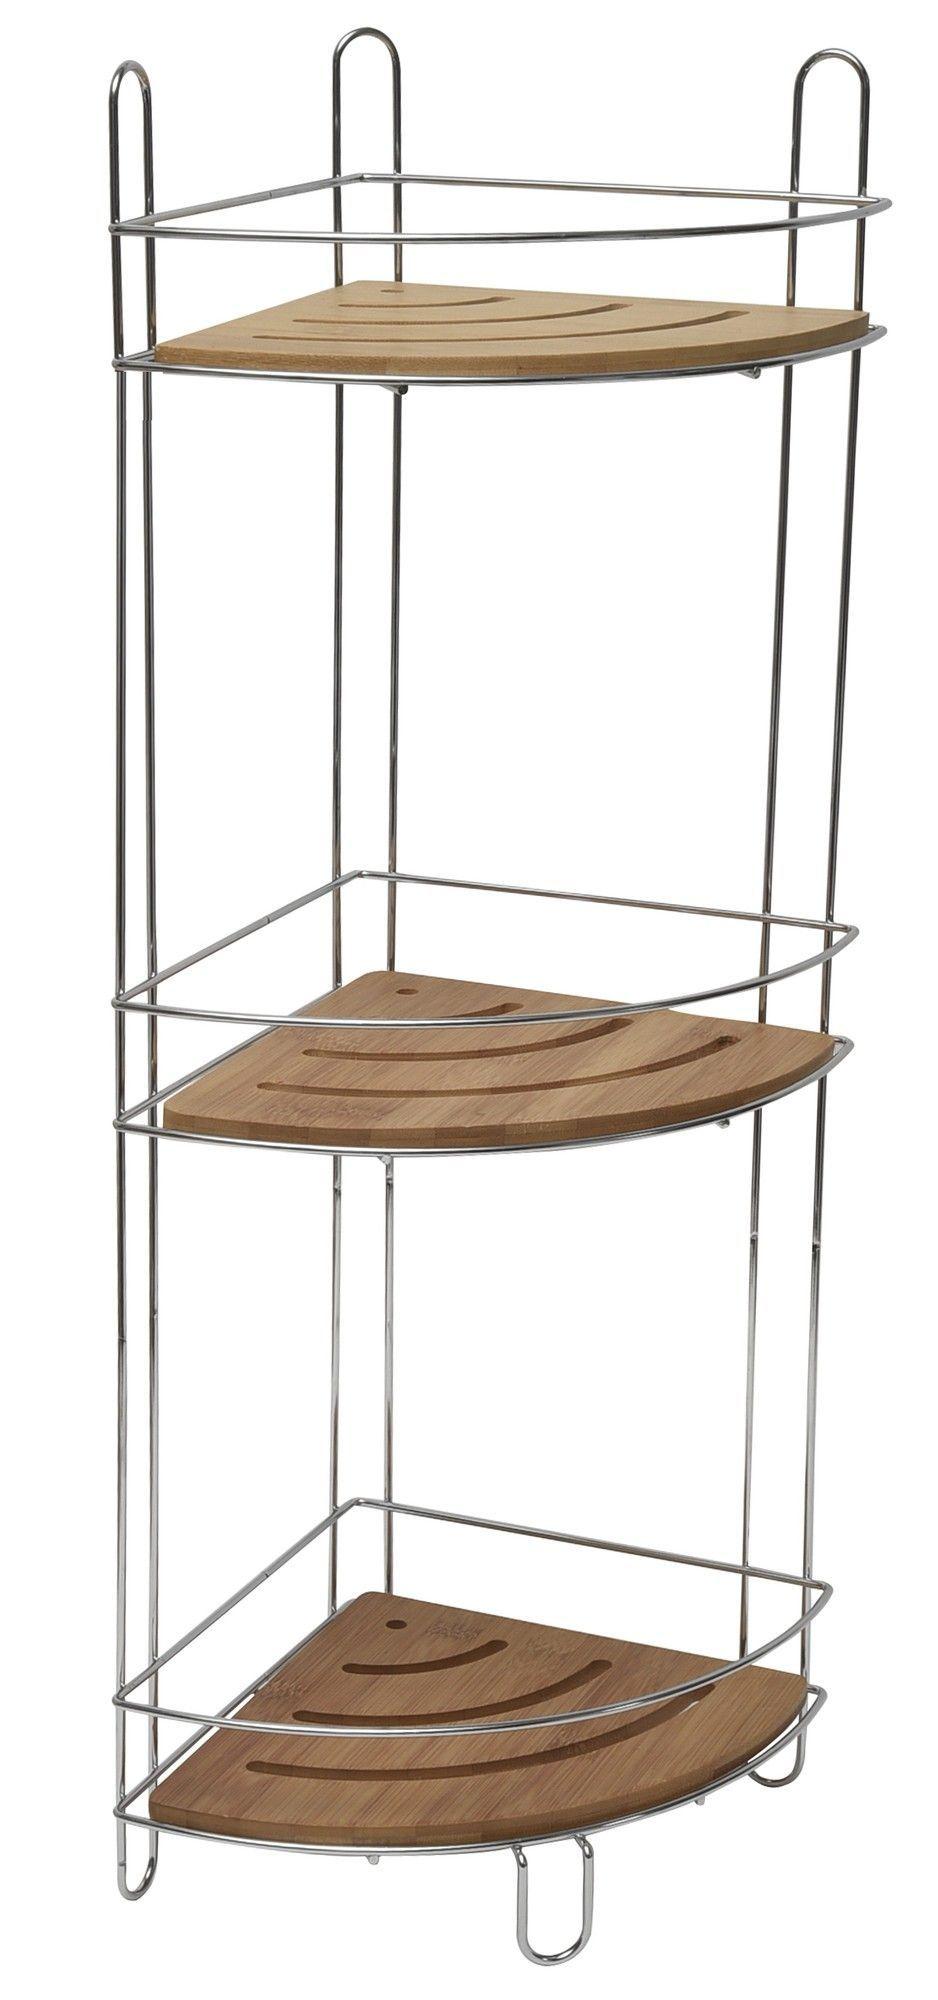 Le Bain Shower Caddy | Standing shower, Shower corner shelf and Corner